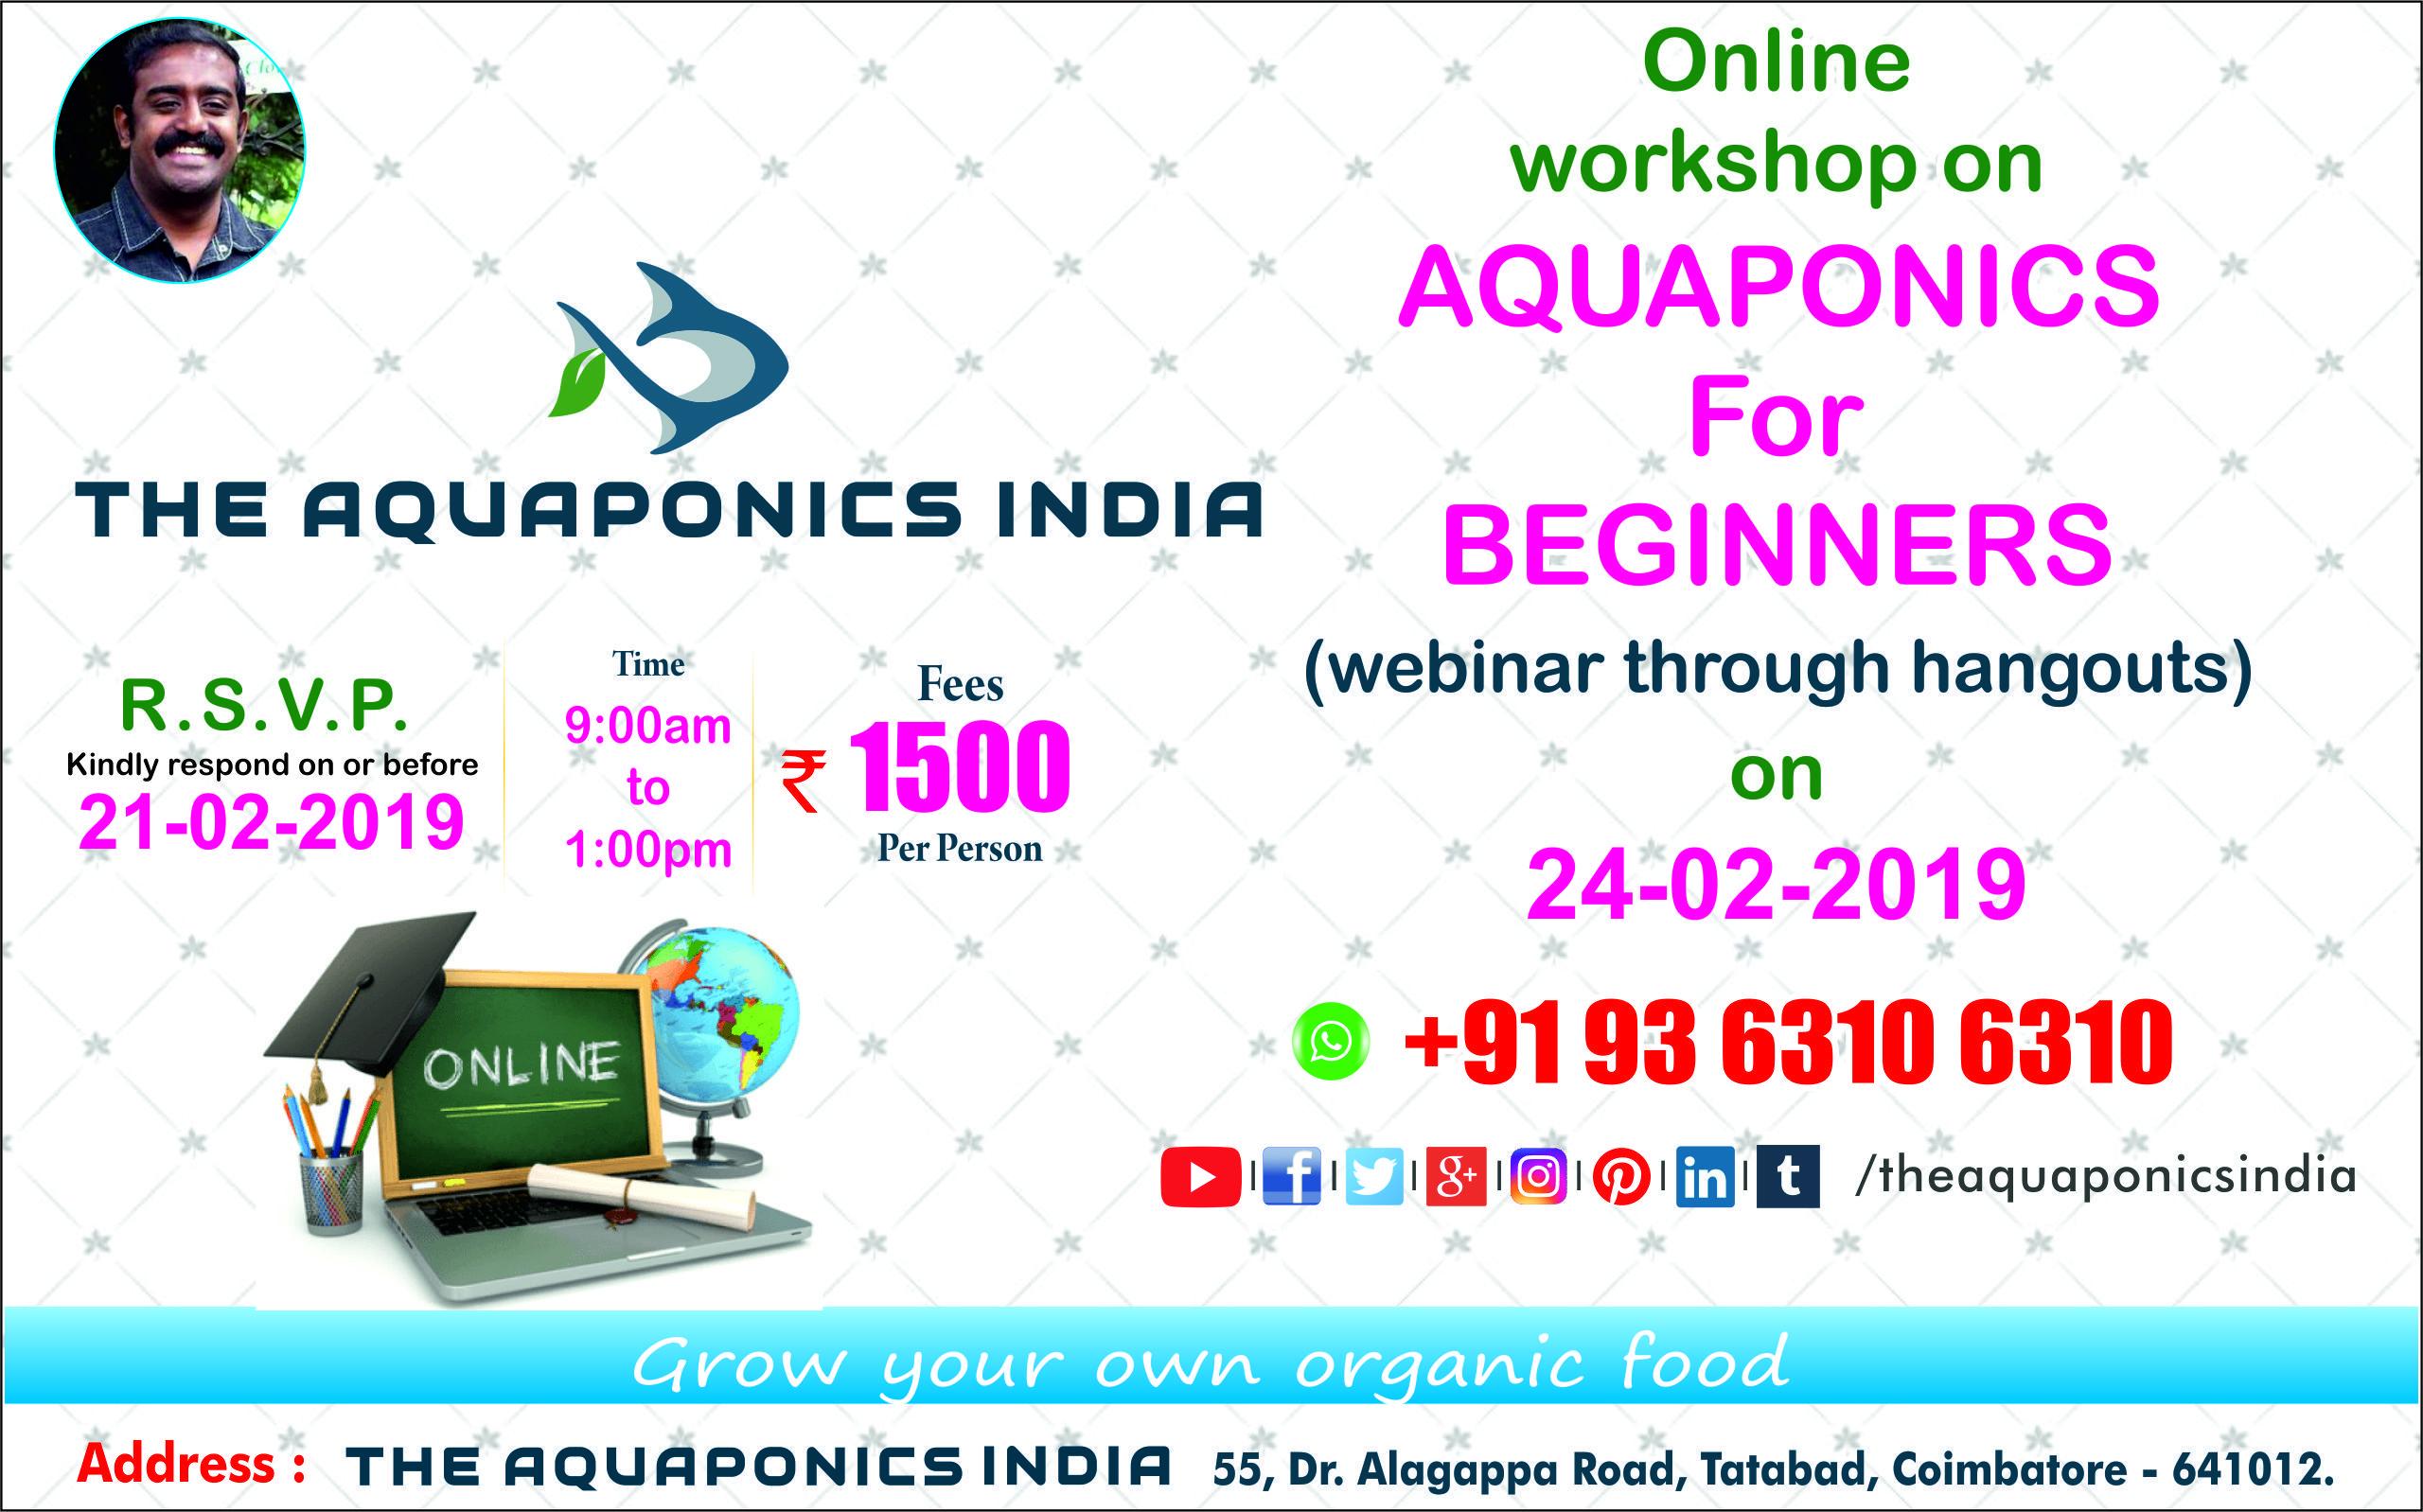 Online Workshop / Training / Class on AQUAPONICS for